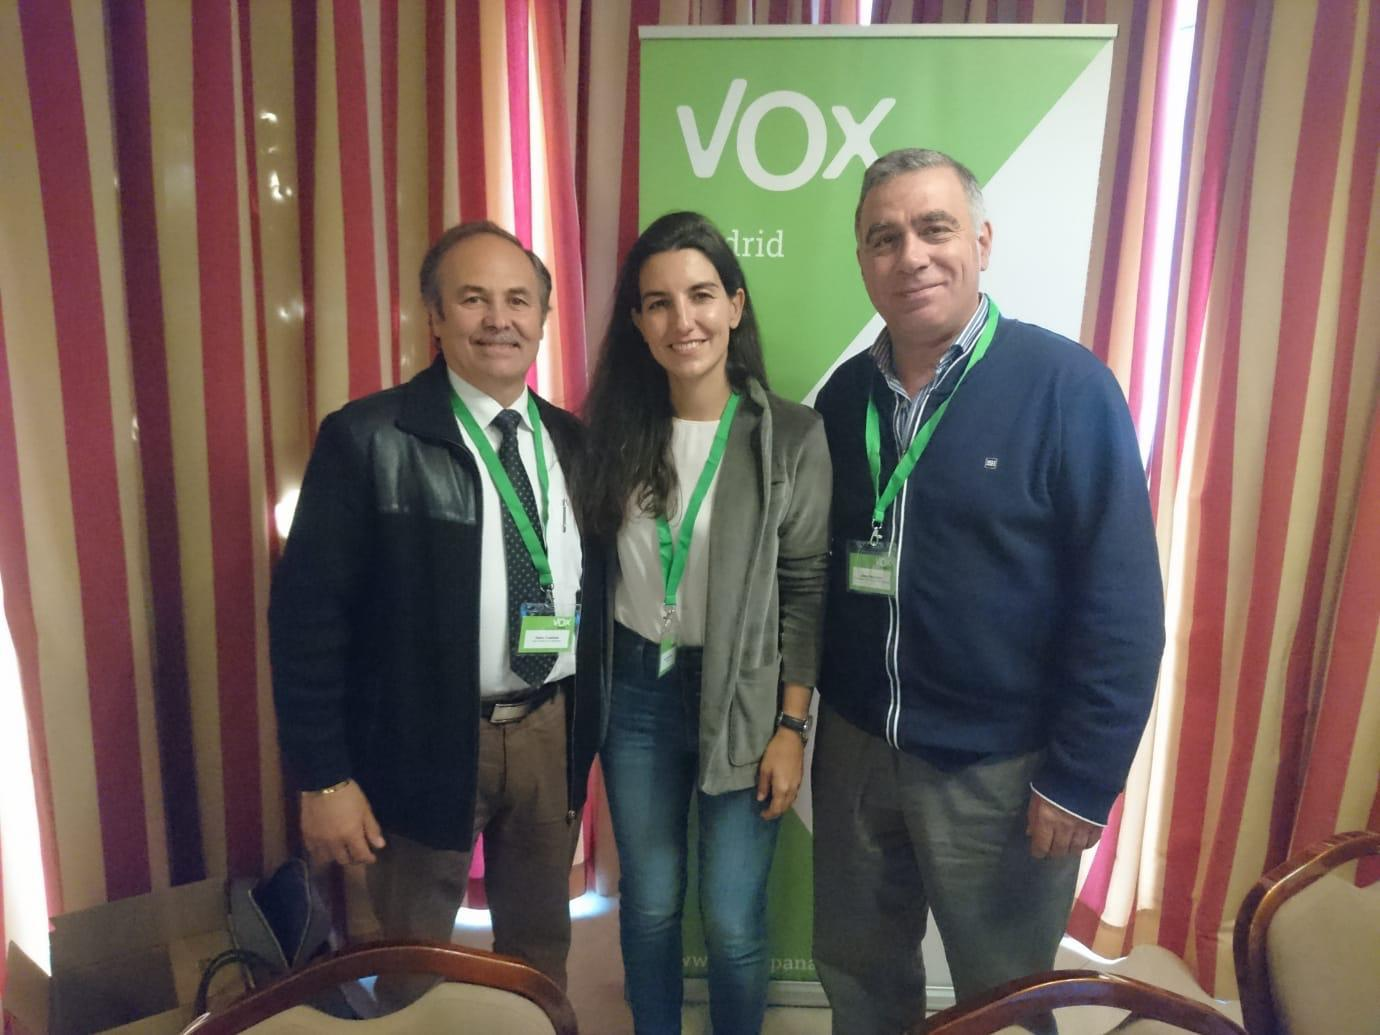 Domingo 3 de Marzo, Plaza de Ondarreta: Mesa Informativa de Vox – San Fernando de Henares.